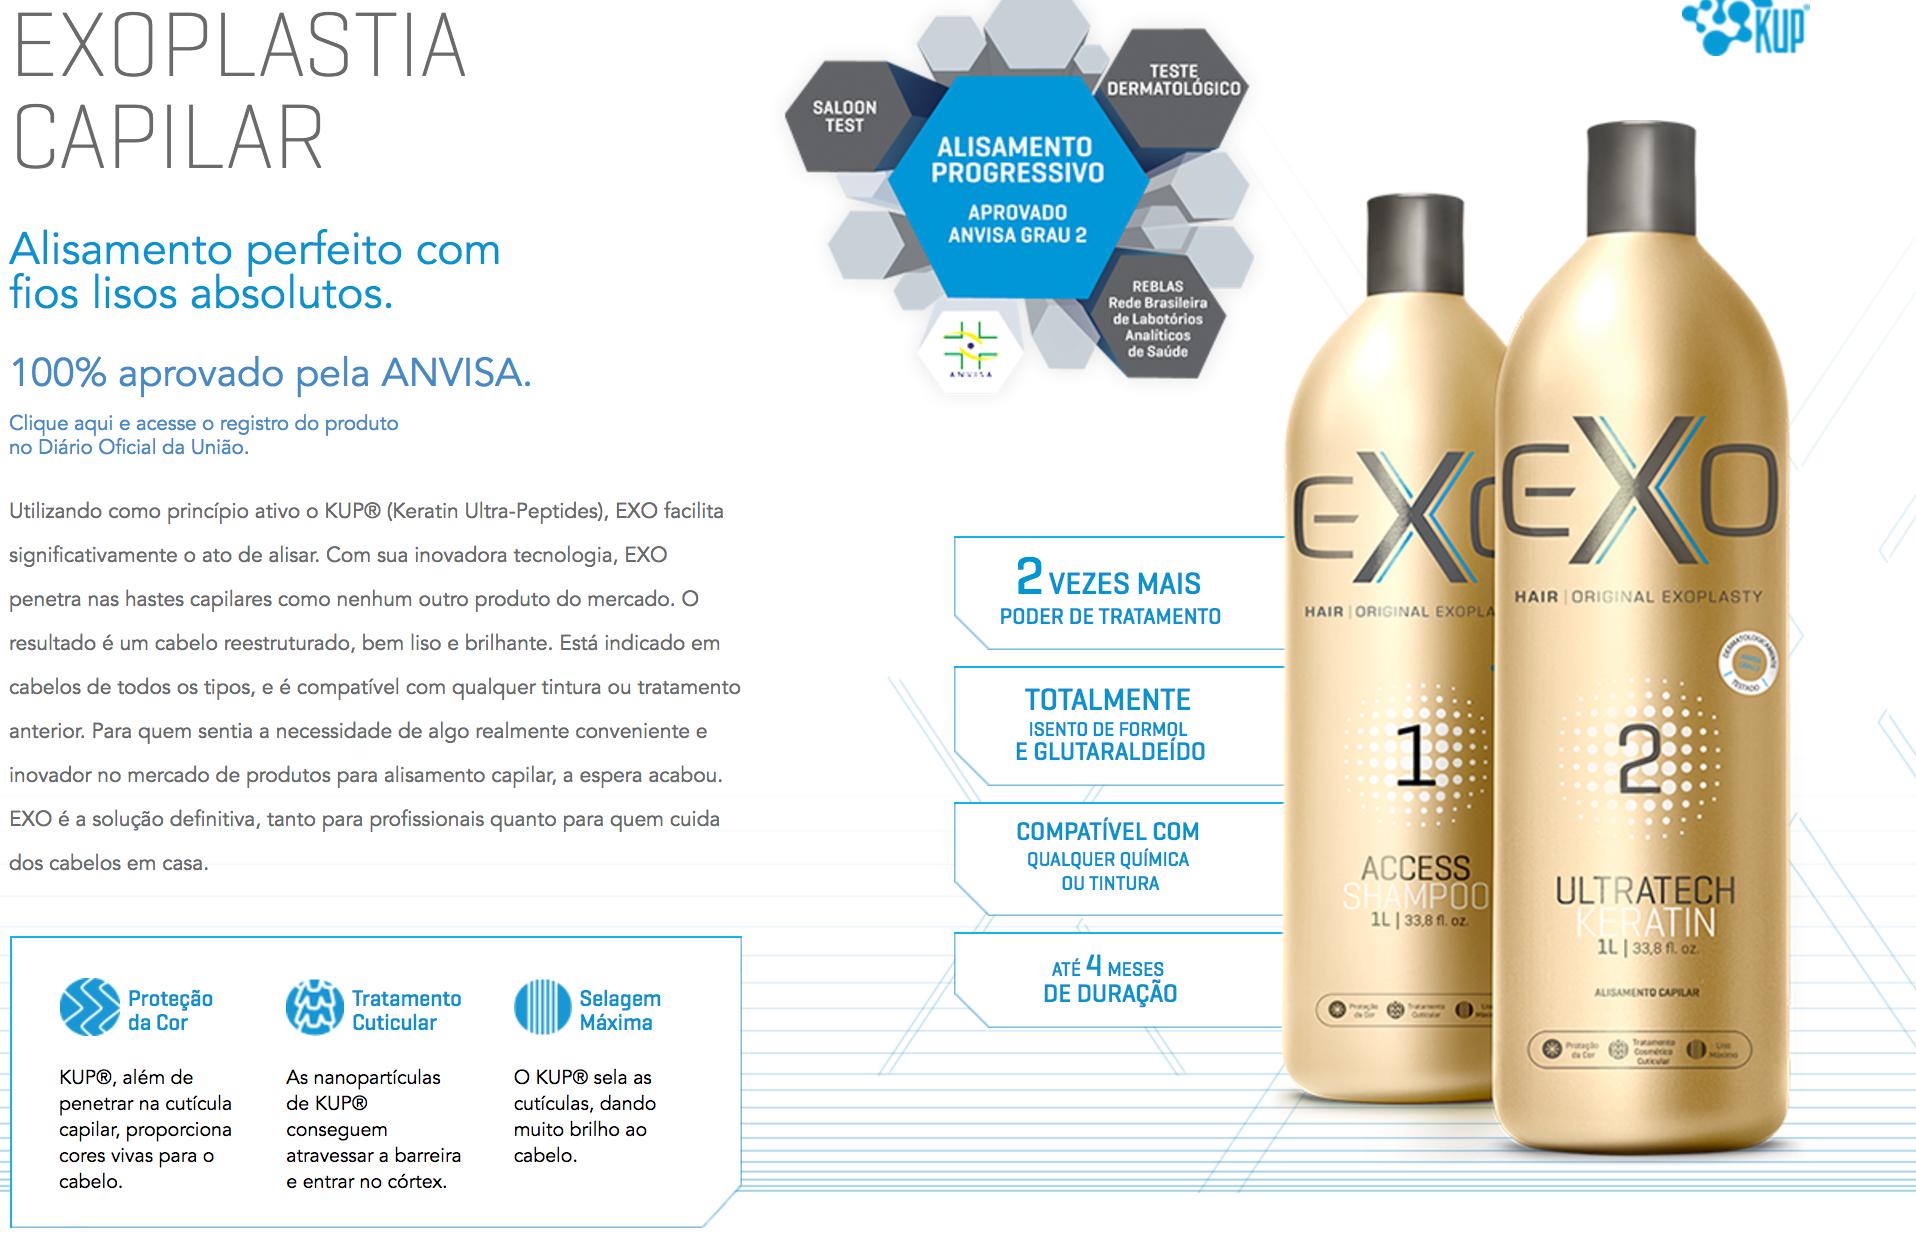 9508c6f39 Exo Hair exoplastia Ultratech Keratin 500ml passo 2 alisamento sem ...